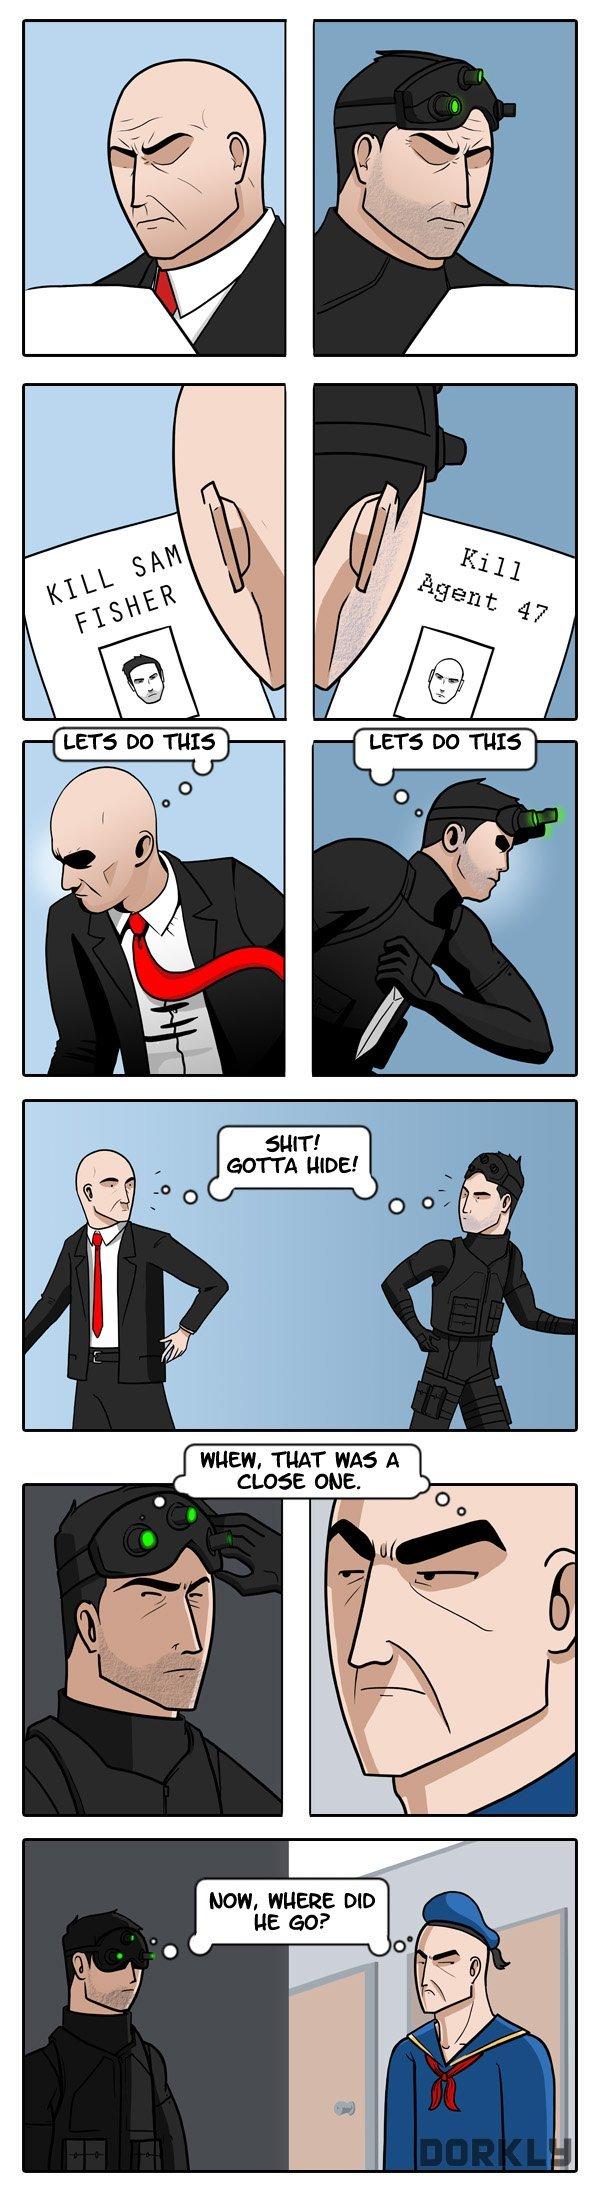 "Hitman vs. Splinter Cell. . an ffl"" ii' A Inline: ."